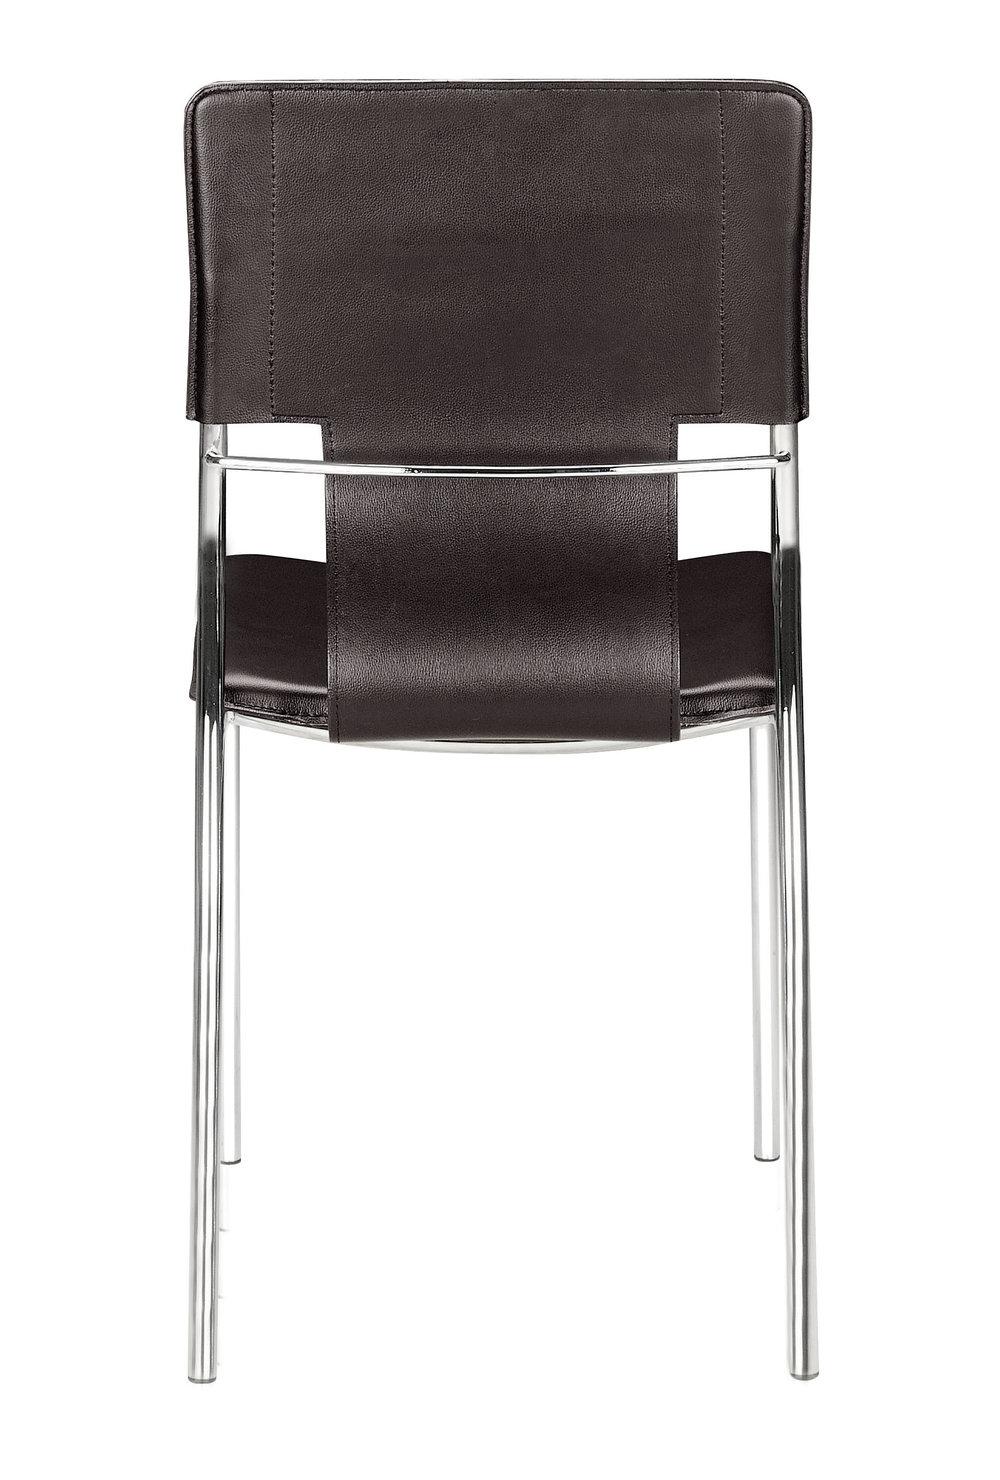 ZUO MODERN CONTEMPORARY, INC - Trafico Dining Chair - Set of 4 - Espresso